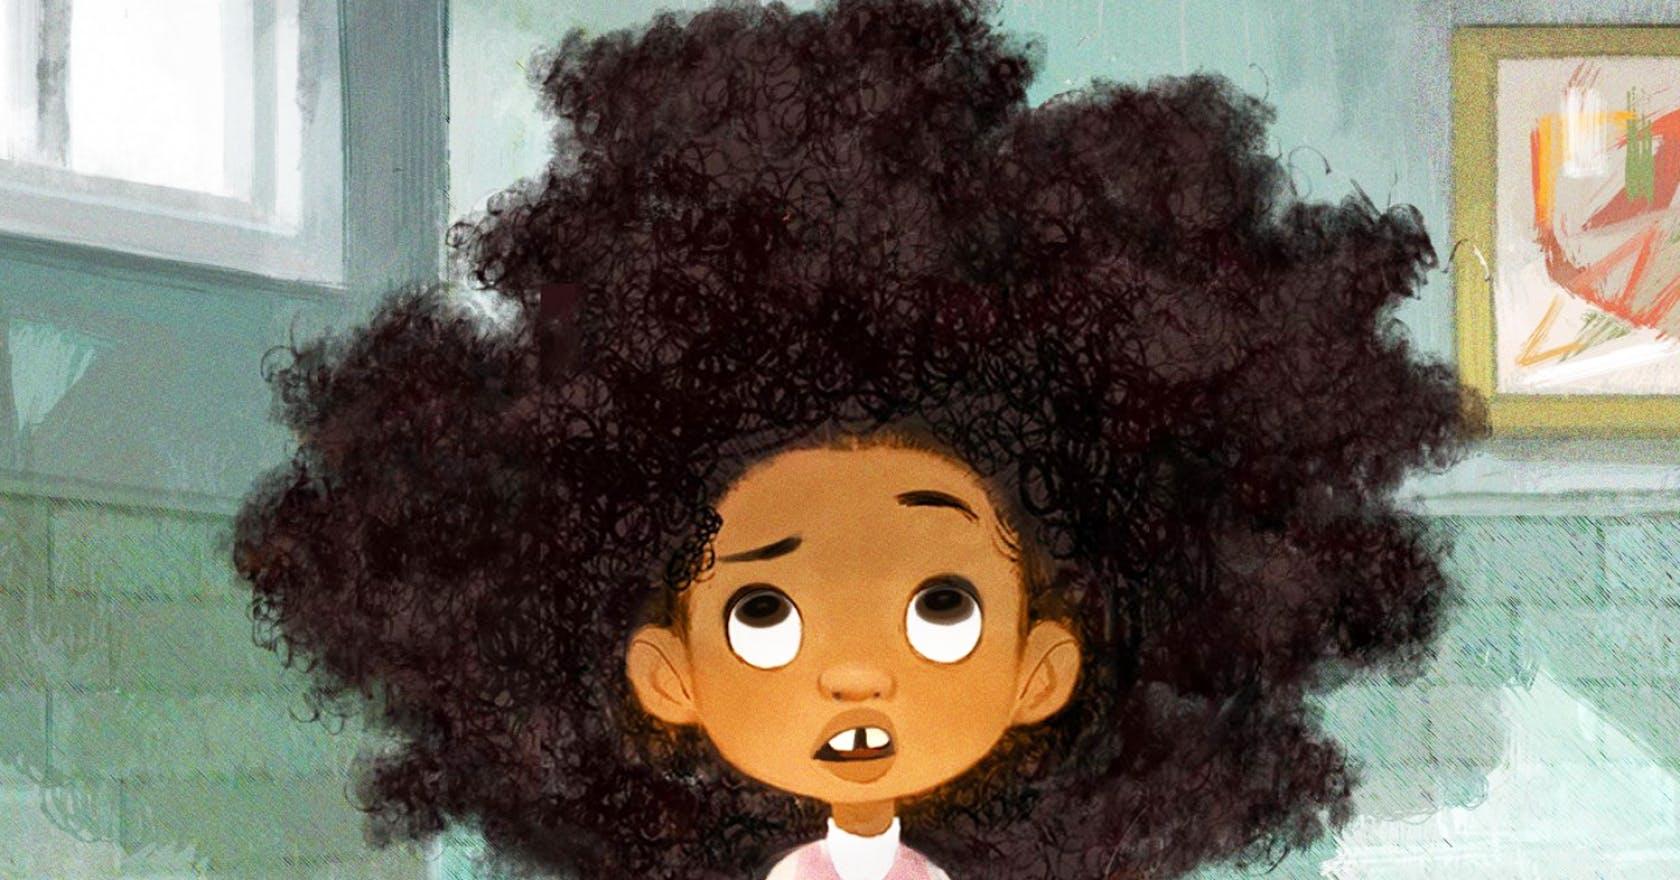 Oscars 2020: true story behind this award-winning short film celebrating natural hair